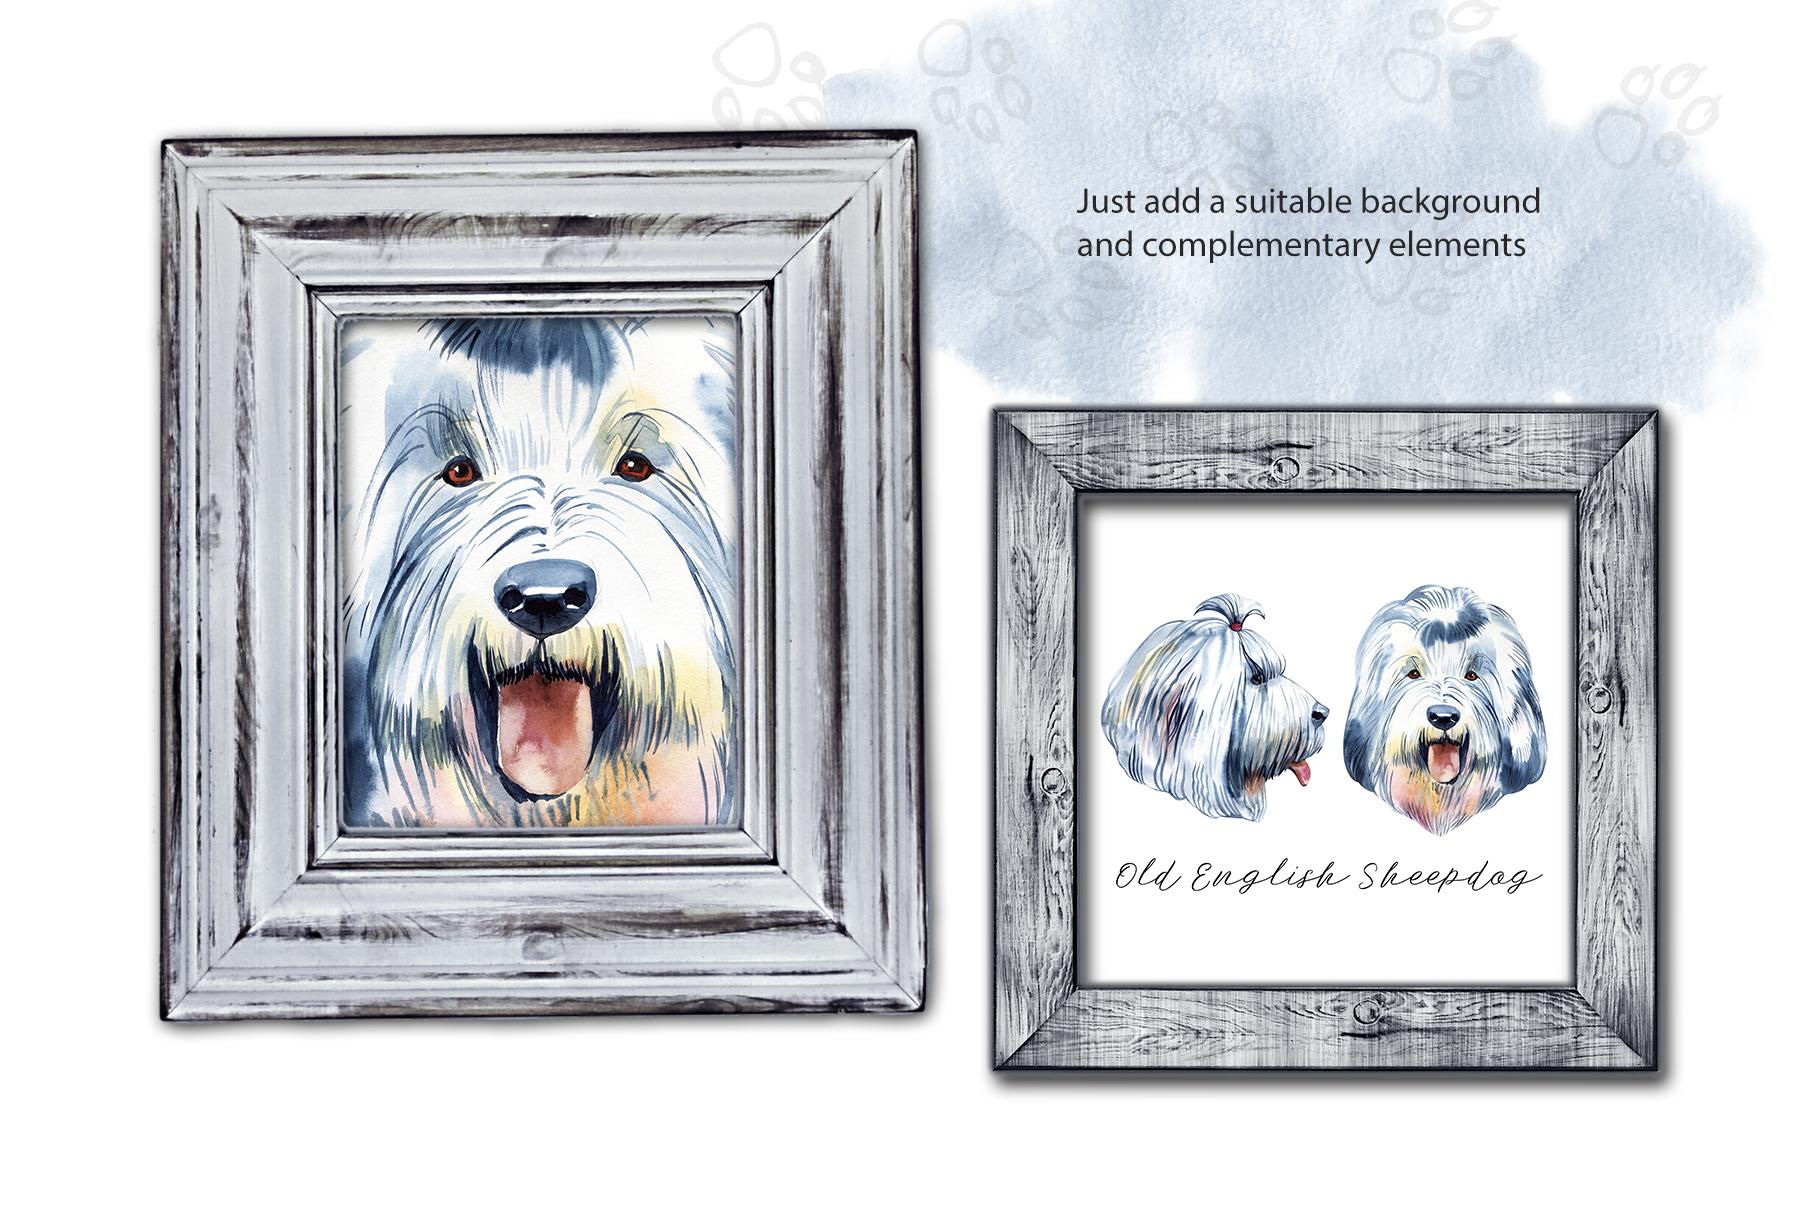 Watercolor dog. Old English Sheepdog example image 3